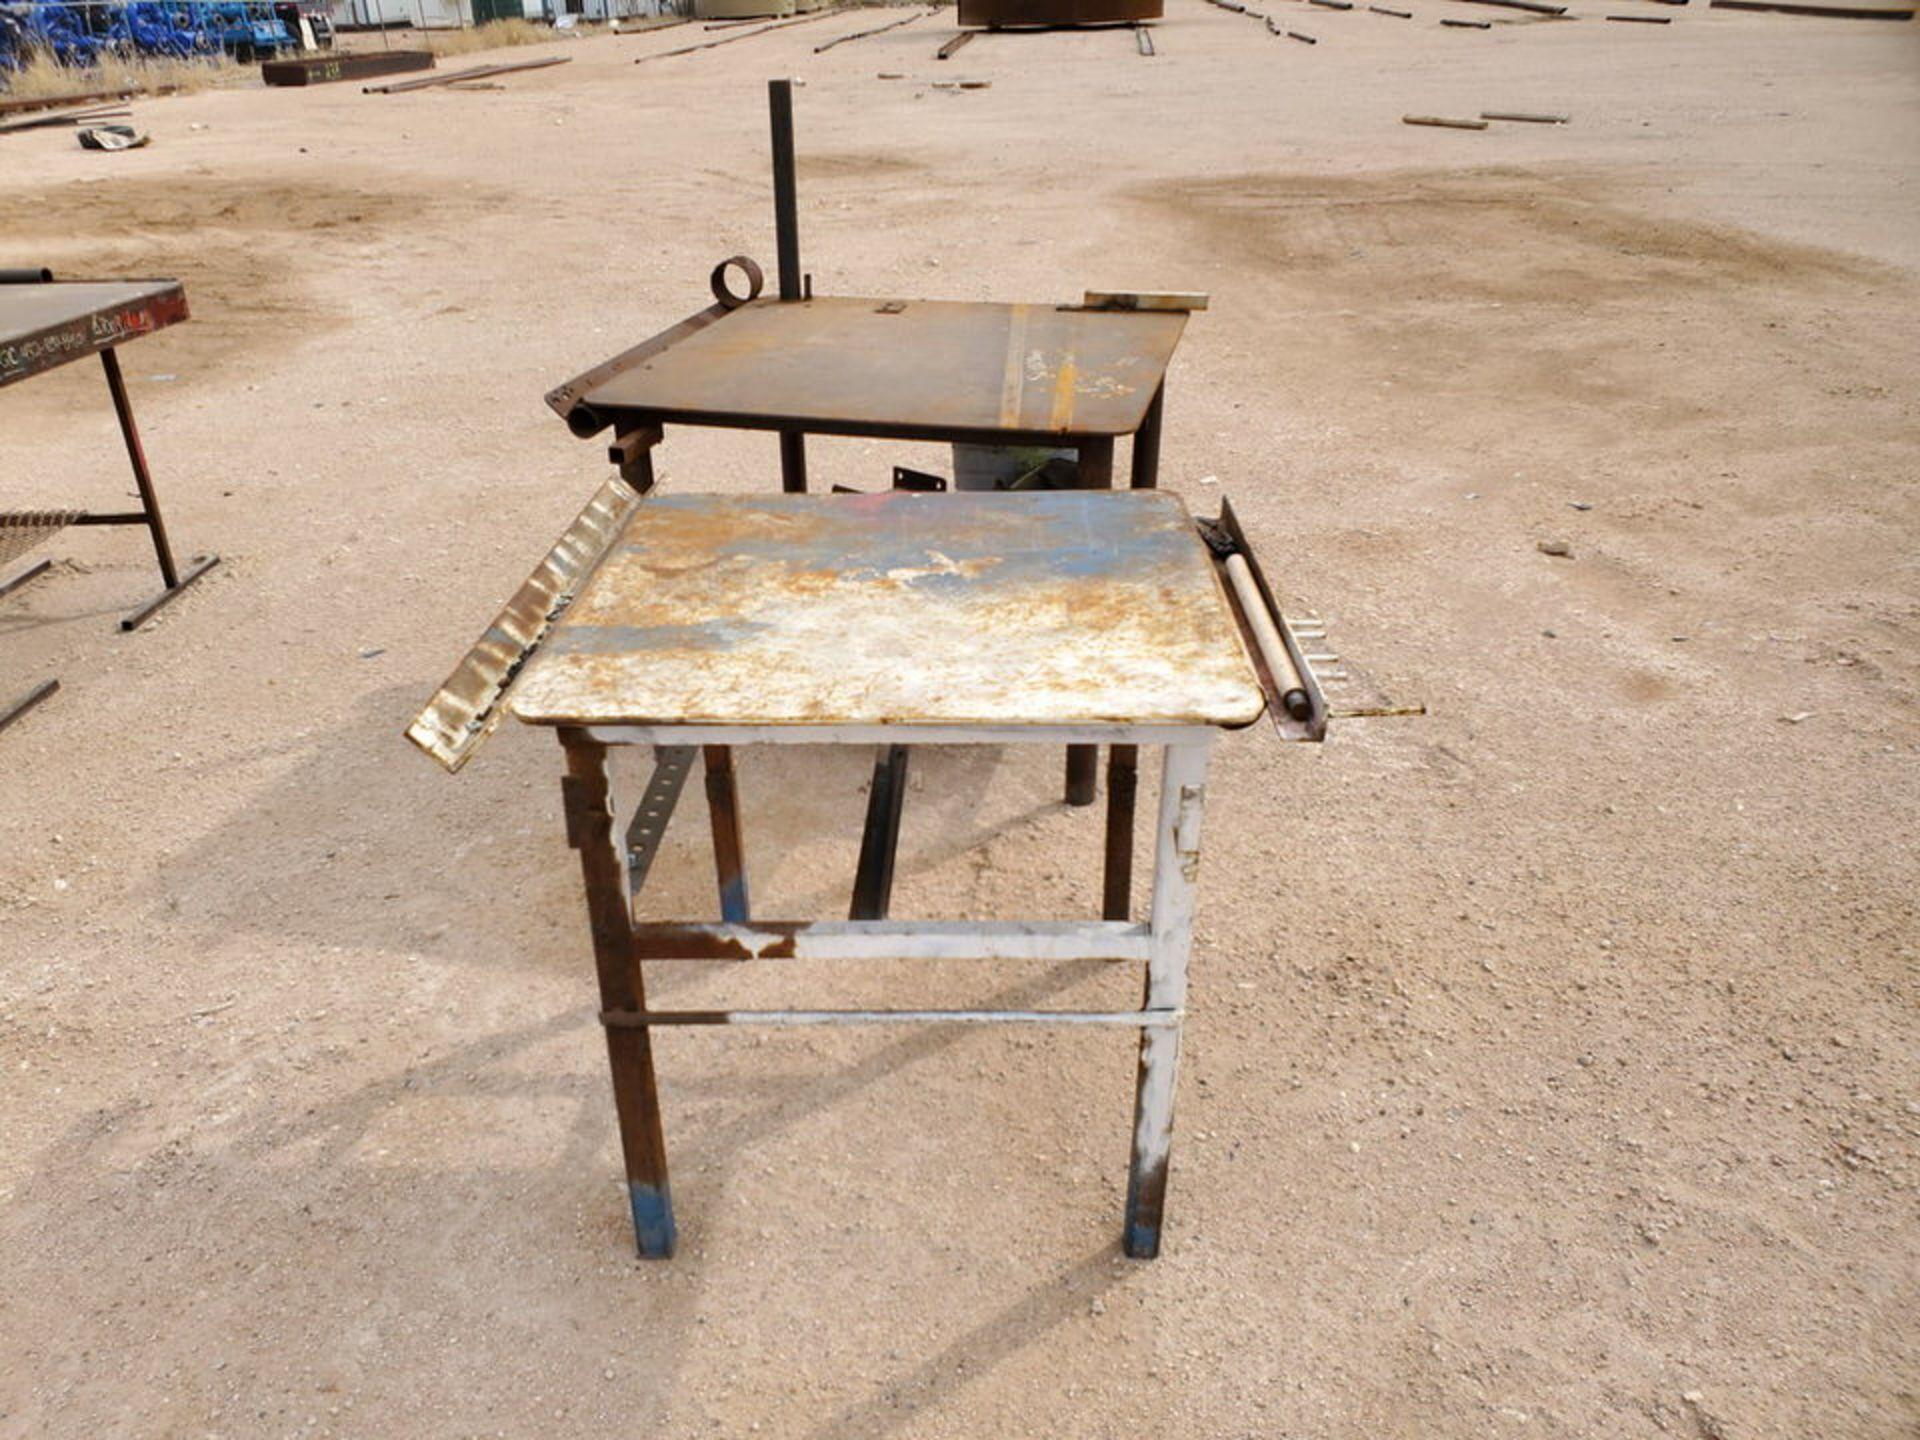 "(2) Stl Welding Tables (1) 43"" x 48"" x 36"", (1) 39"" x 36"" x 36"" - Image 2 of 5"